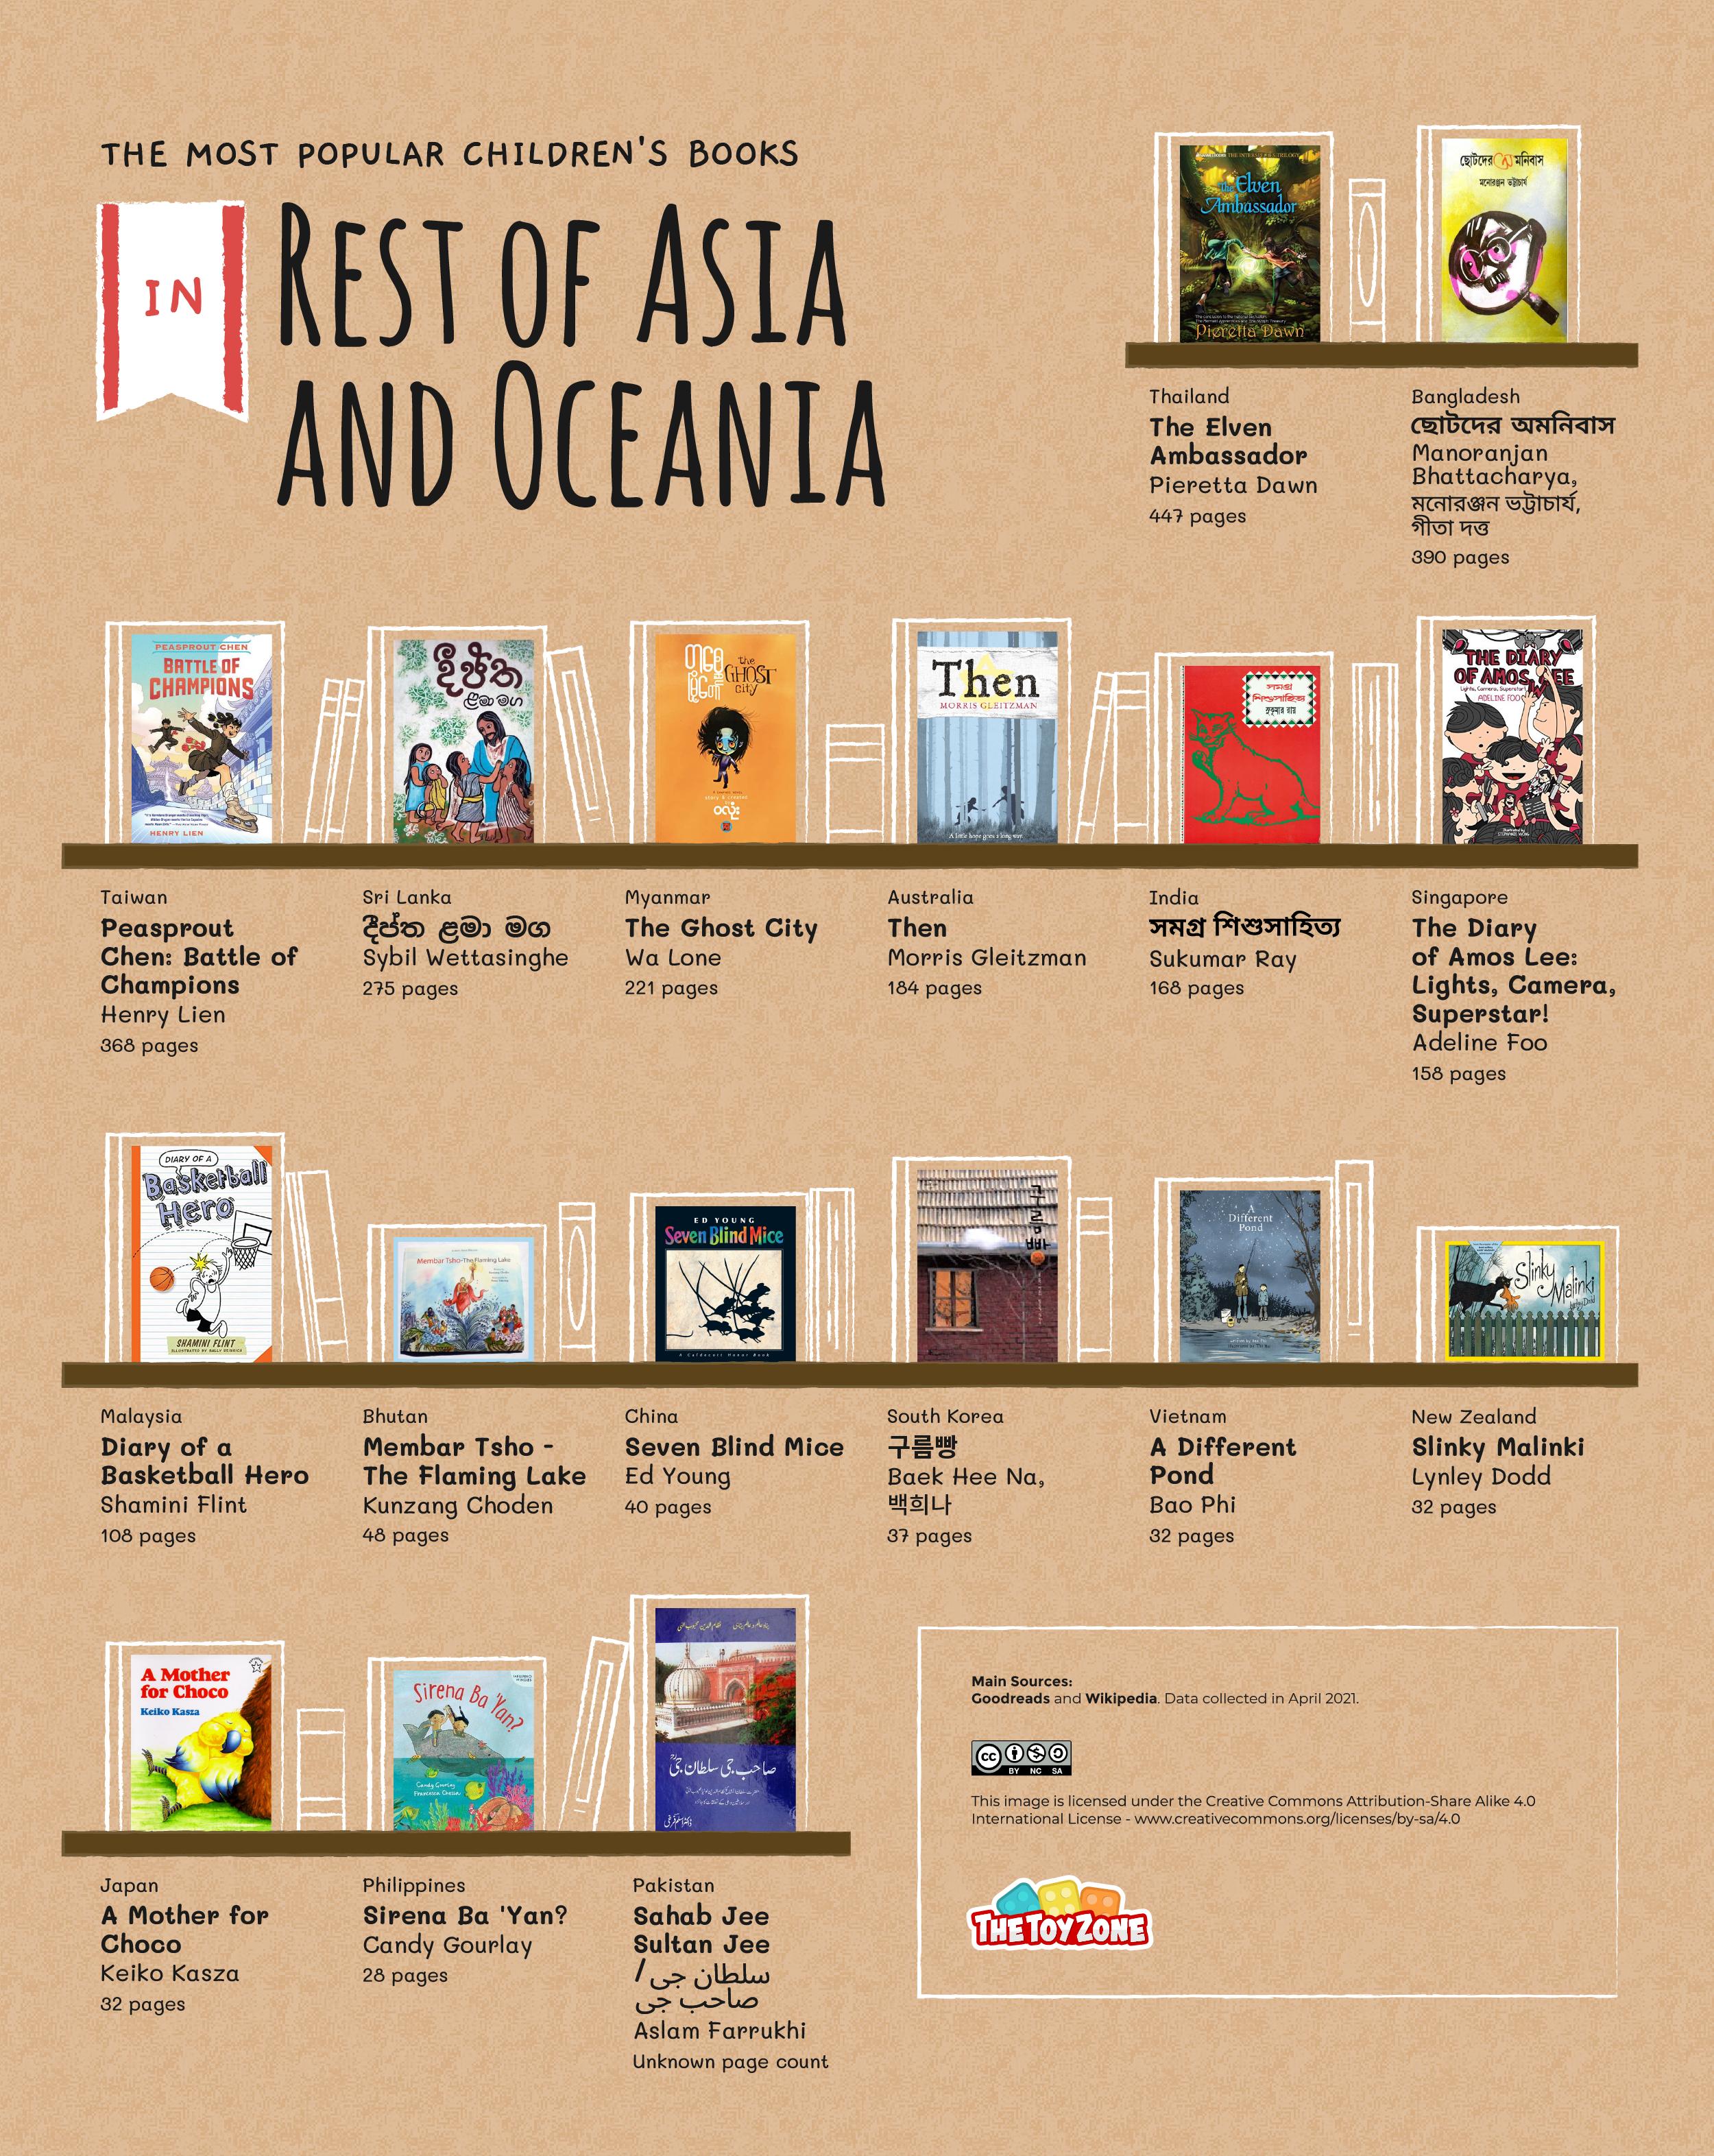 Most popular children's books in Asian and Oceania bookshelf graphic